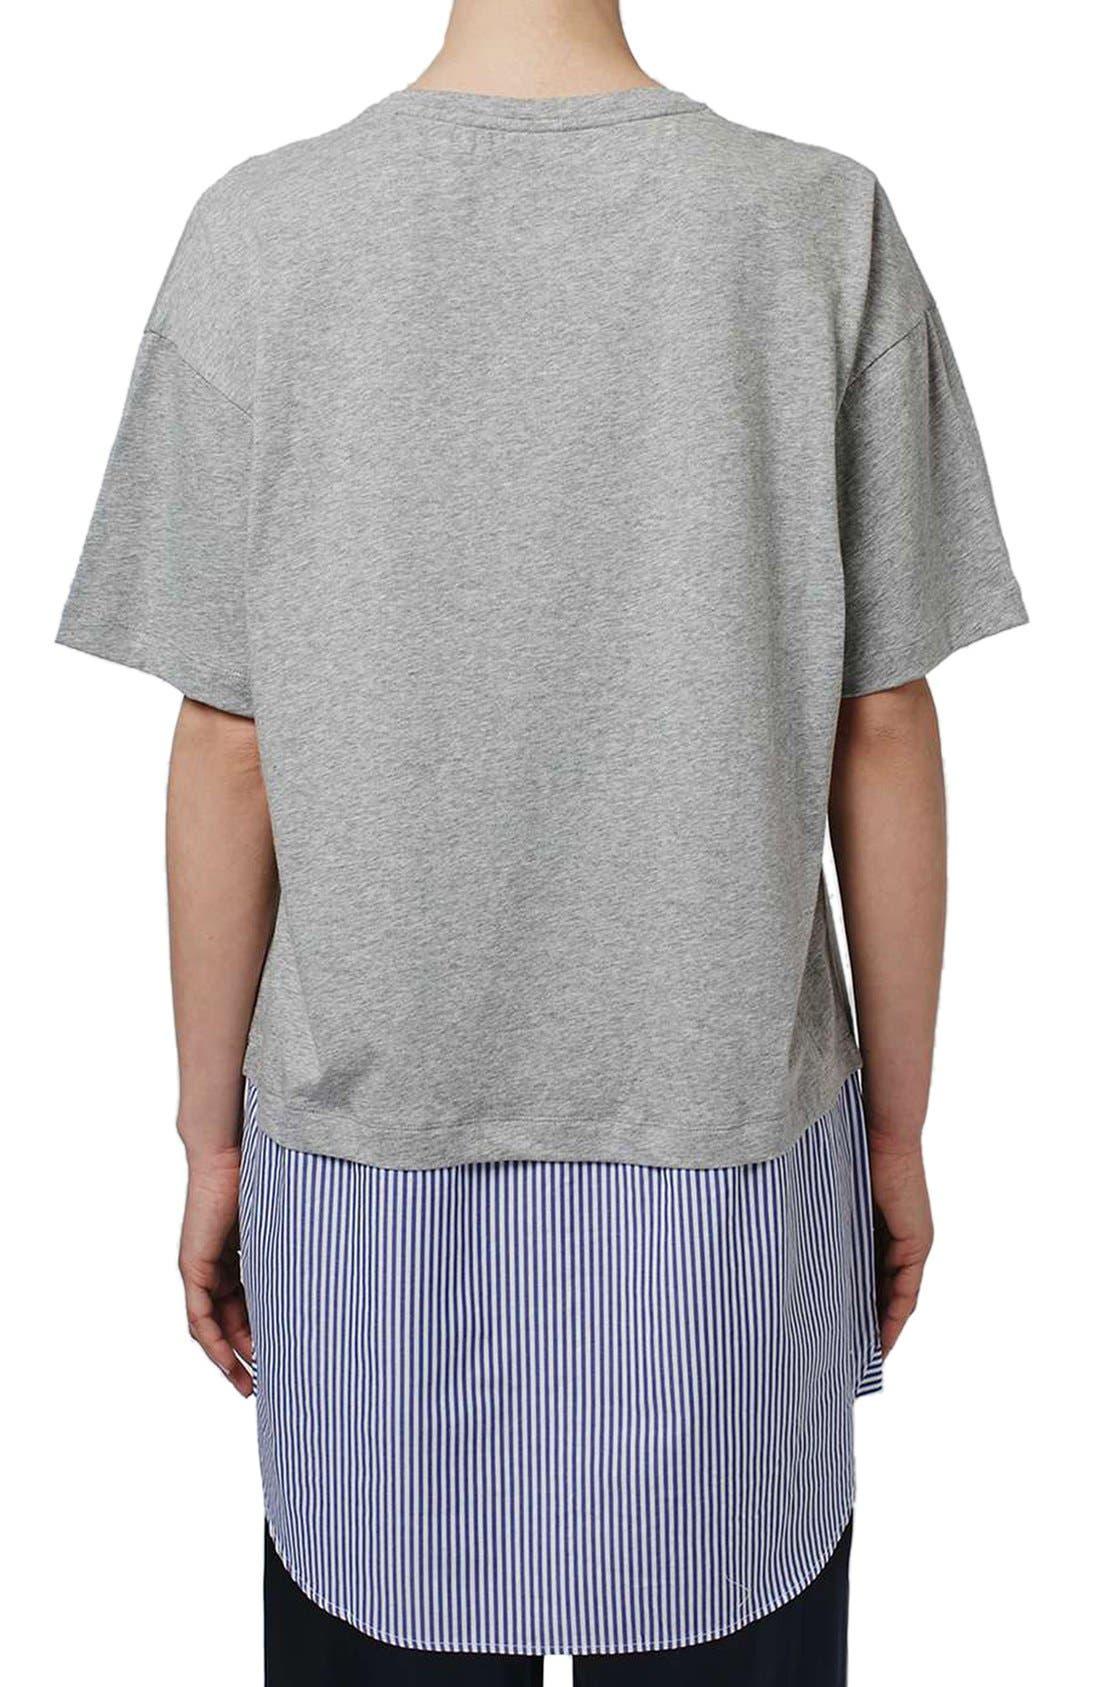 Alternate Image 3  - Topshop Boutique Stripe Shirt Hem T-Shirt Dress